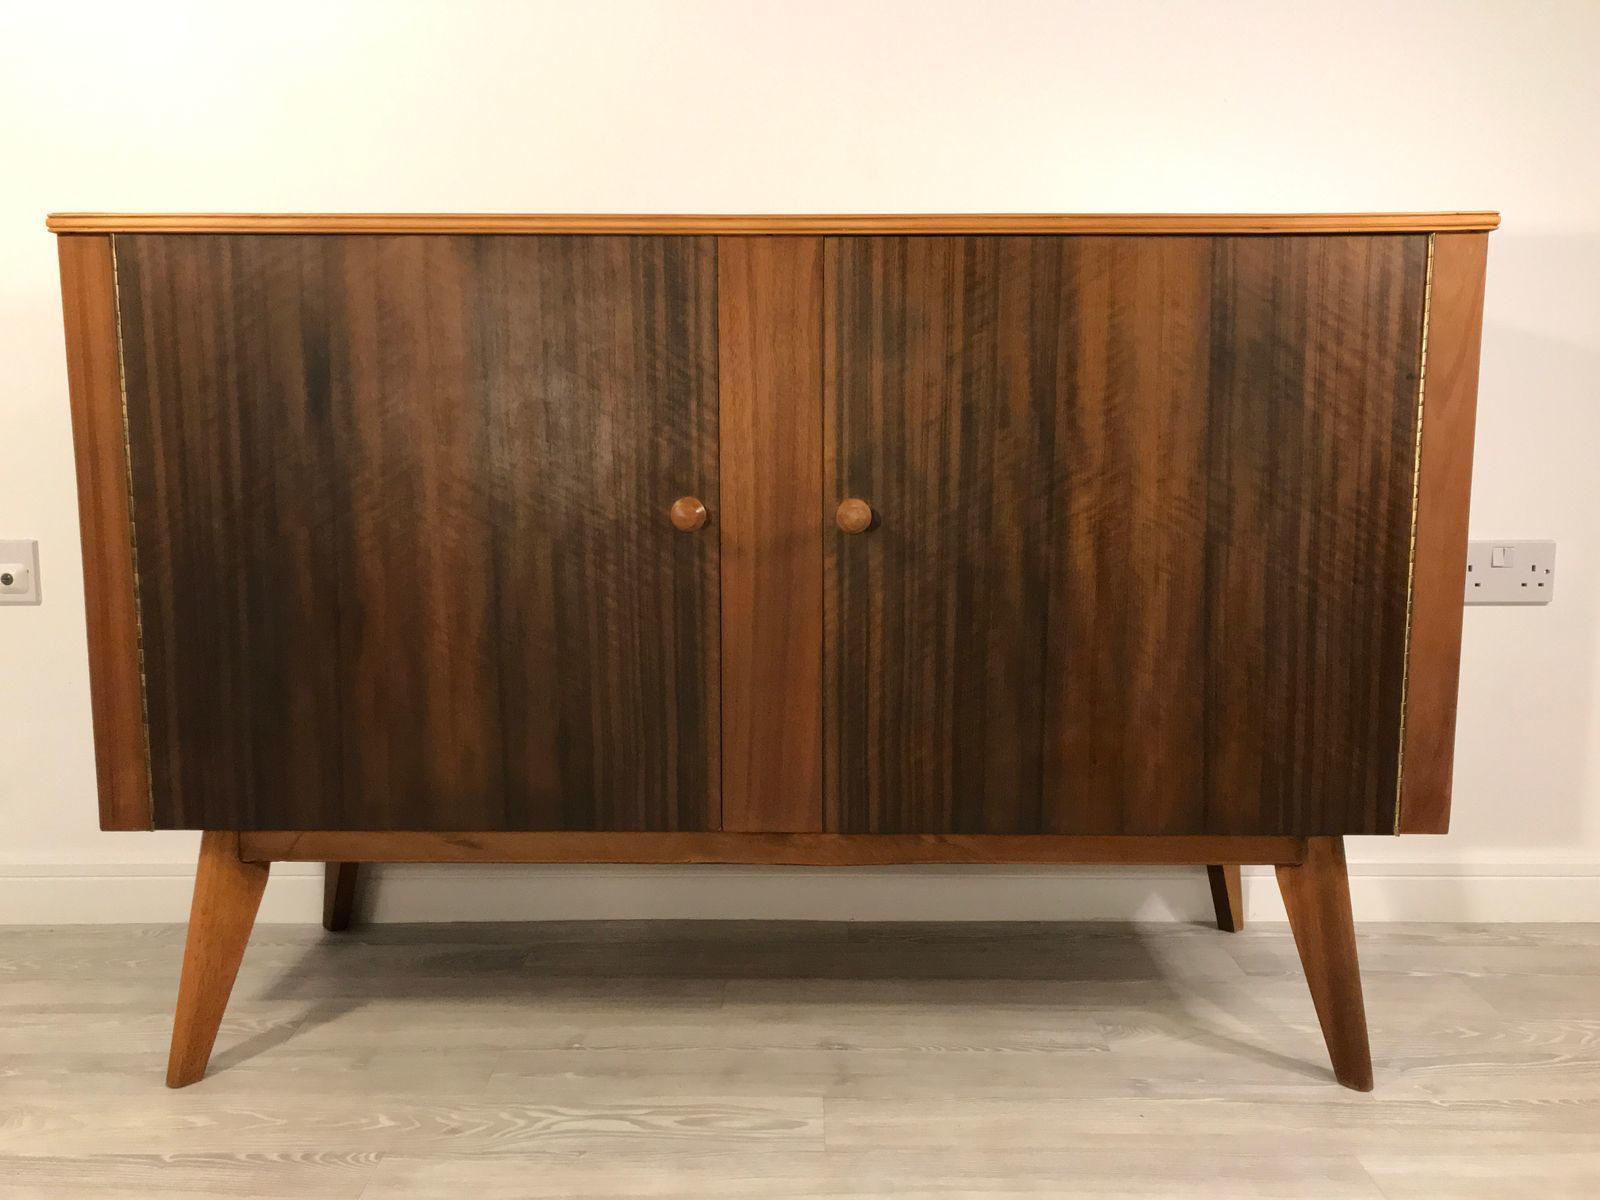 Walnut Sideboard By Neil Morris For Morris Of Glasgow 1950s